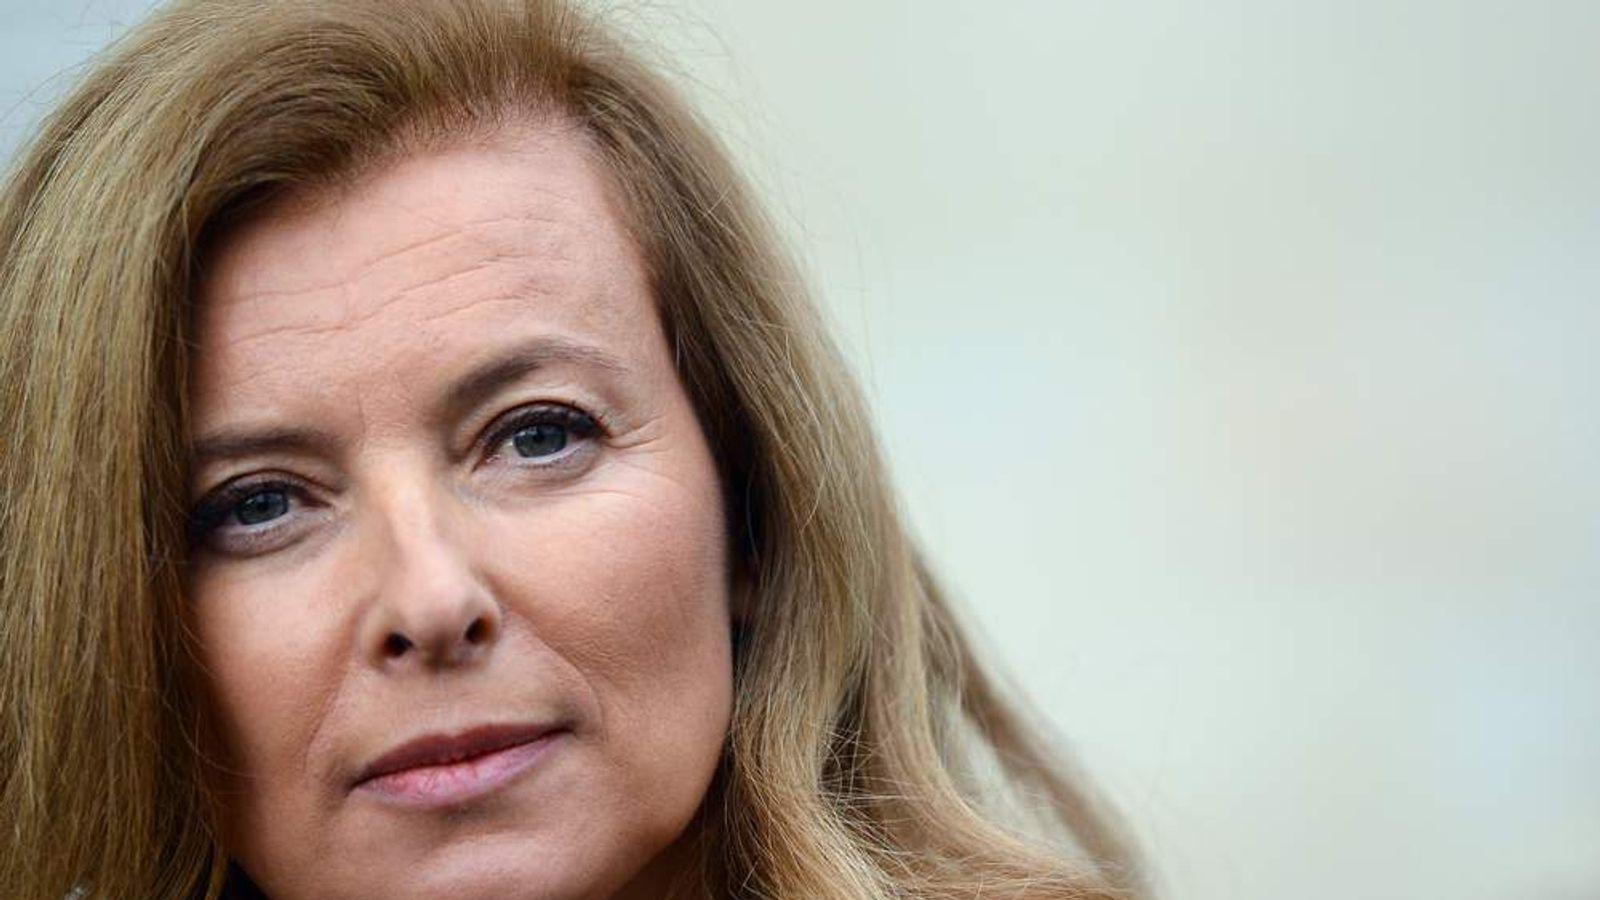 French first lady Valerie Trierweiler